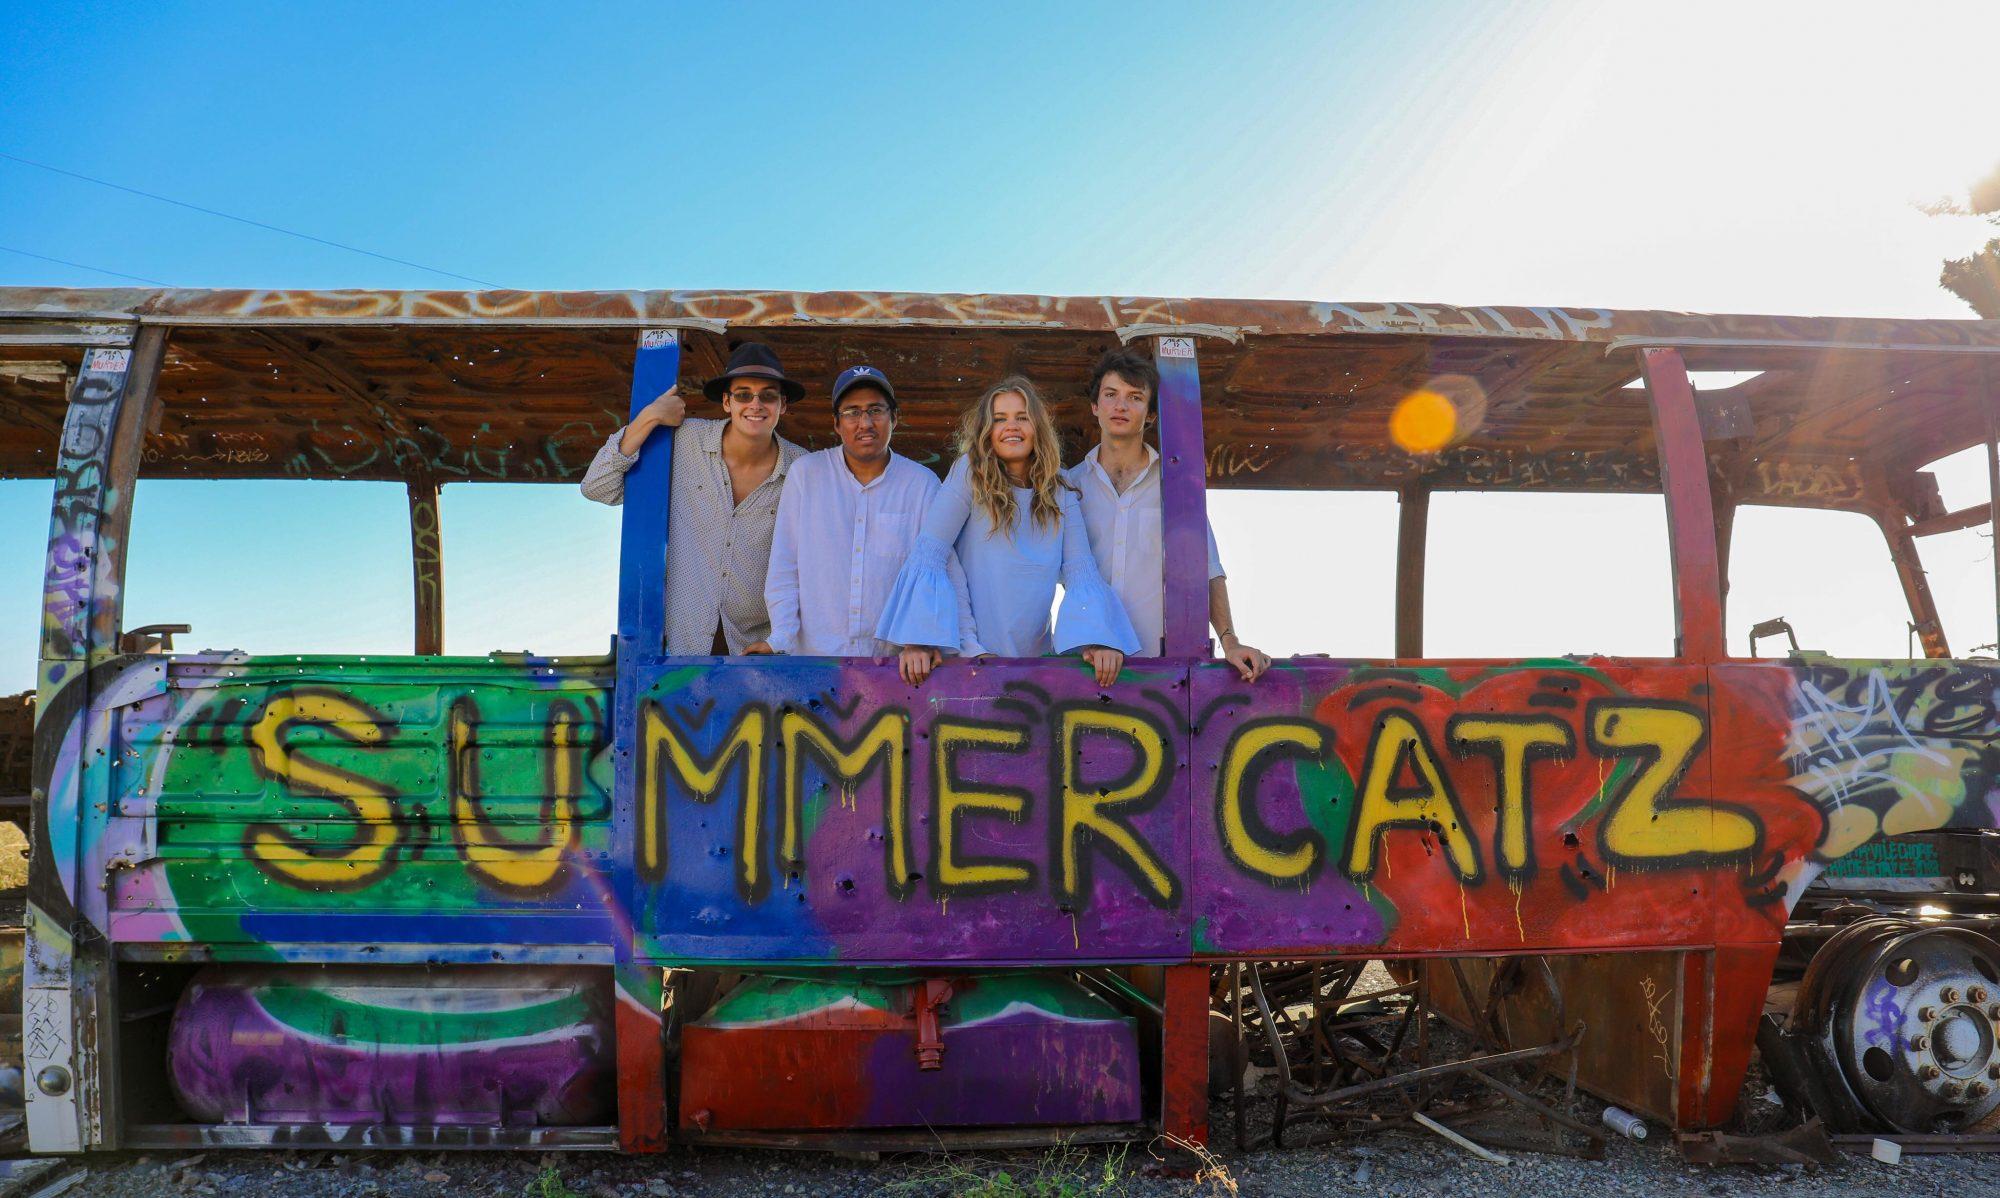 Summercatz